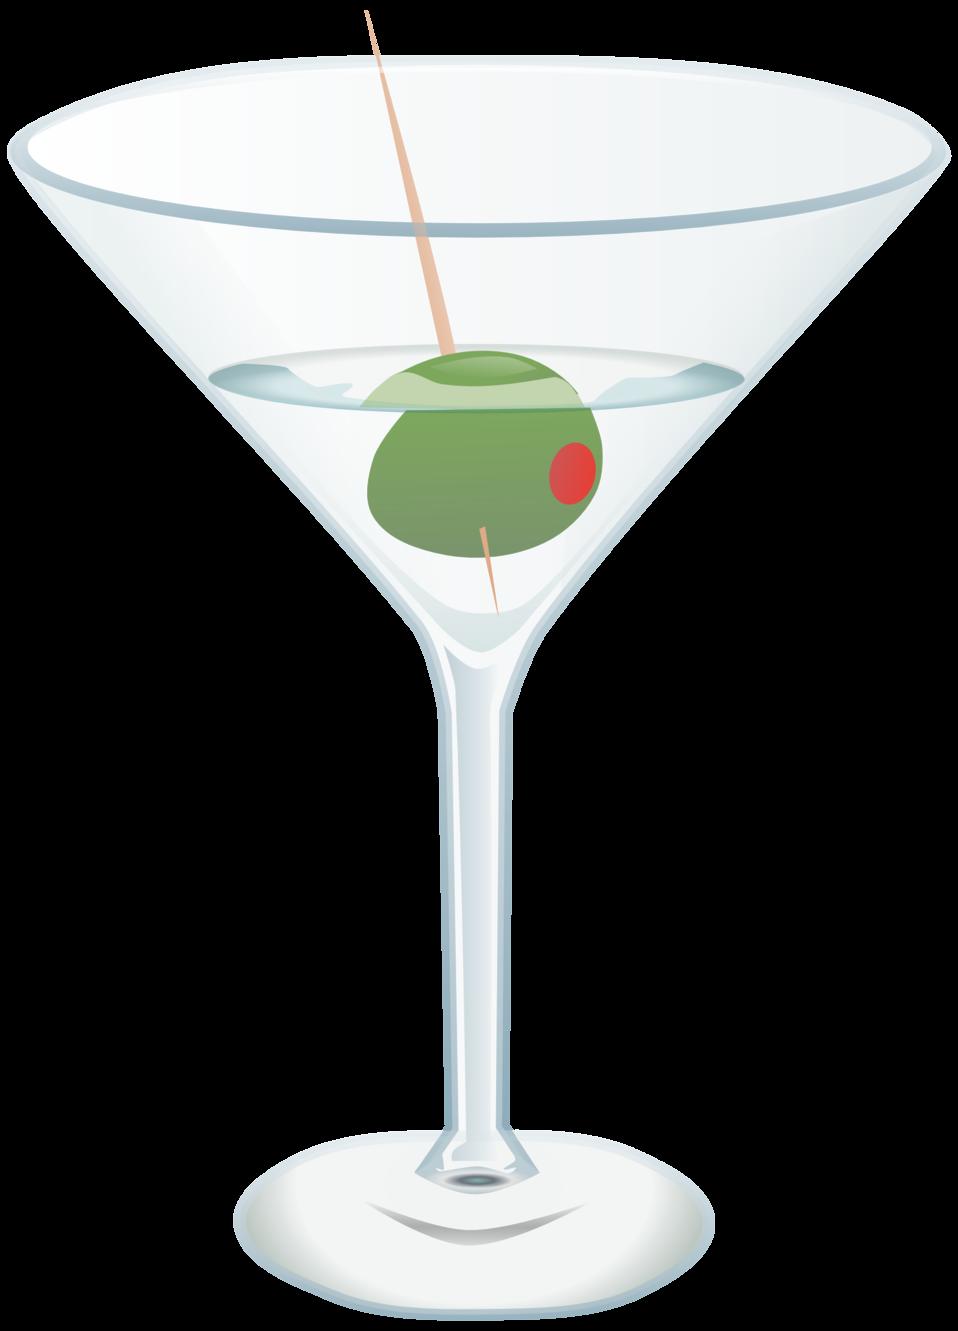 Cocktail clipart martini olive. Public domain clip art